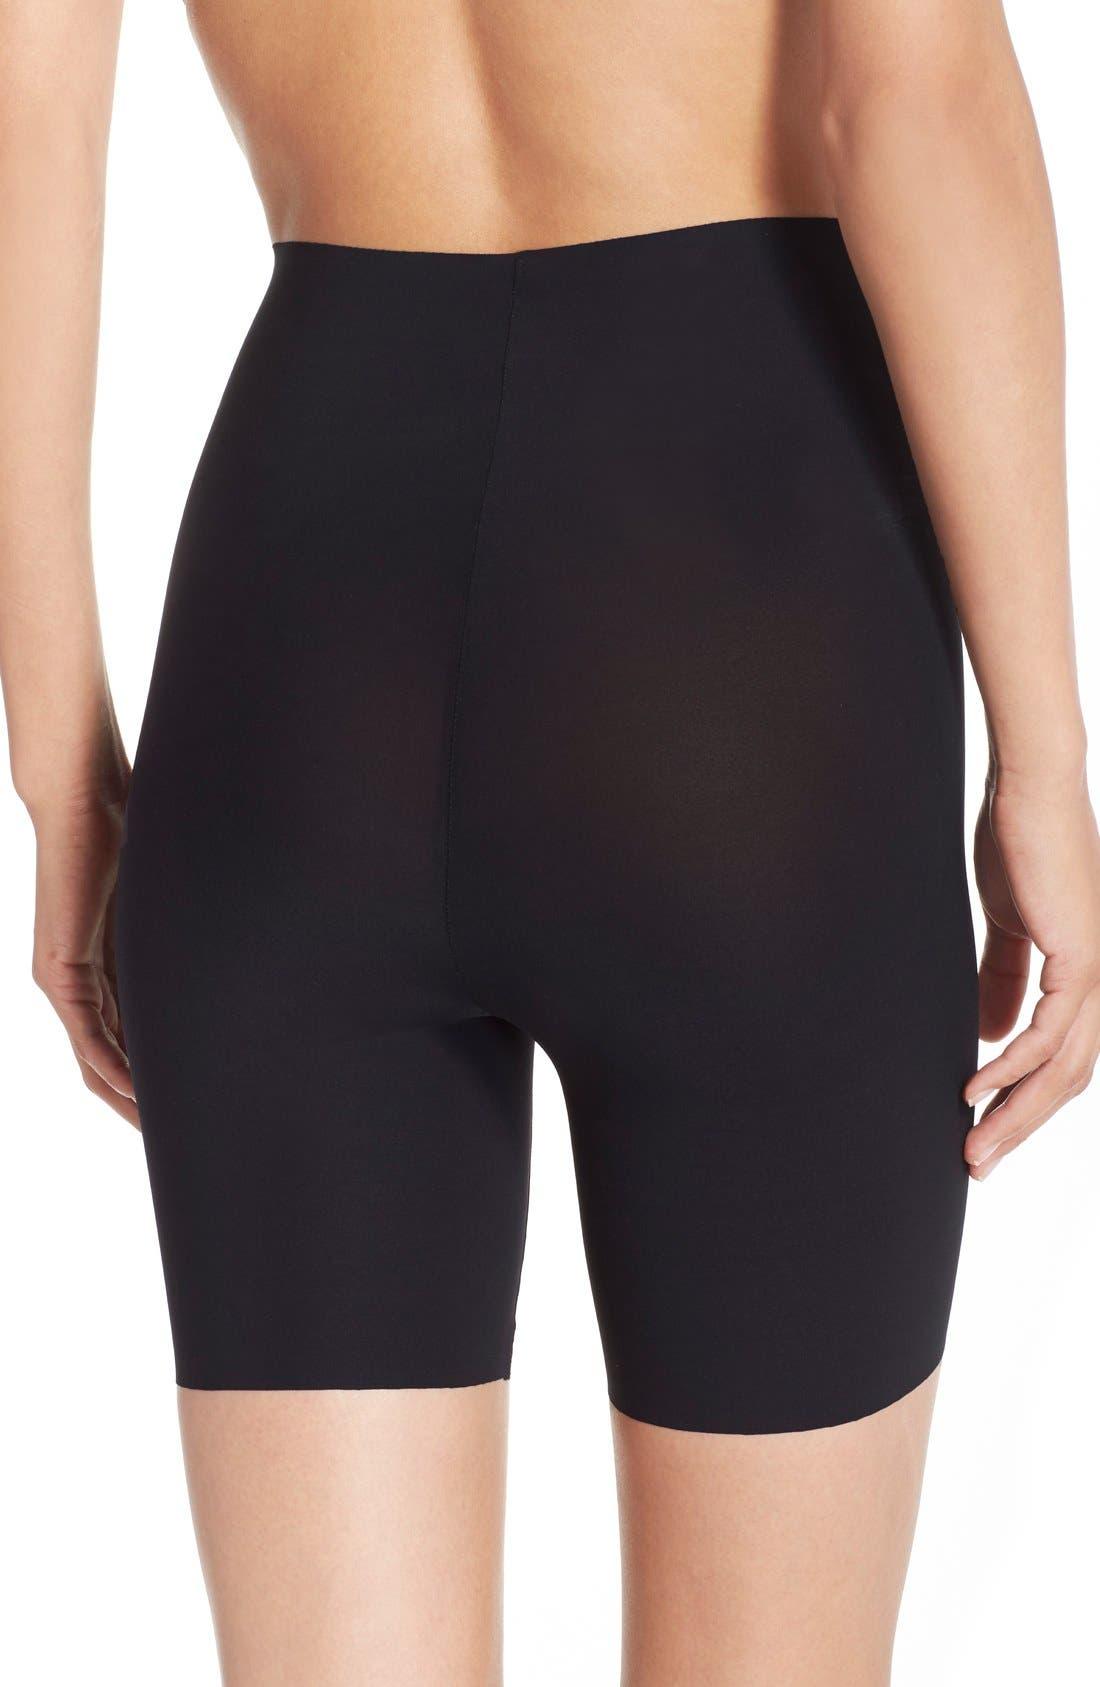 COMMANDO, 'Control' High Waist Shaping Shorts, Alternate thumbnail 2, color, BLACK